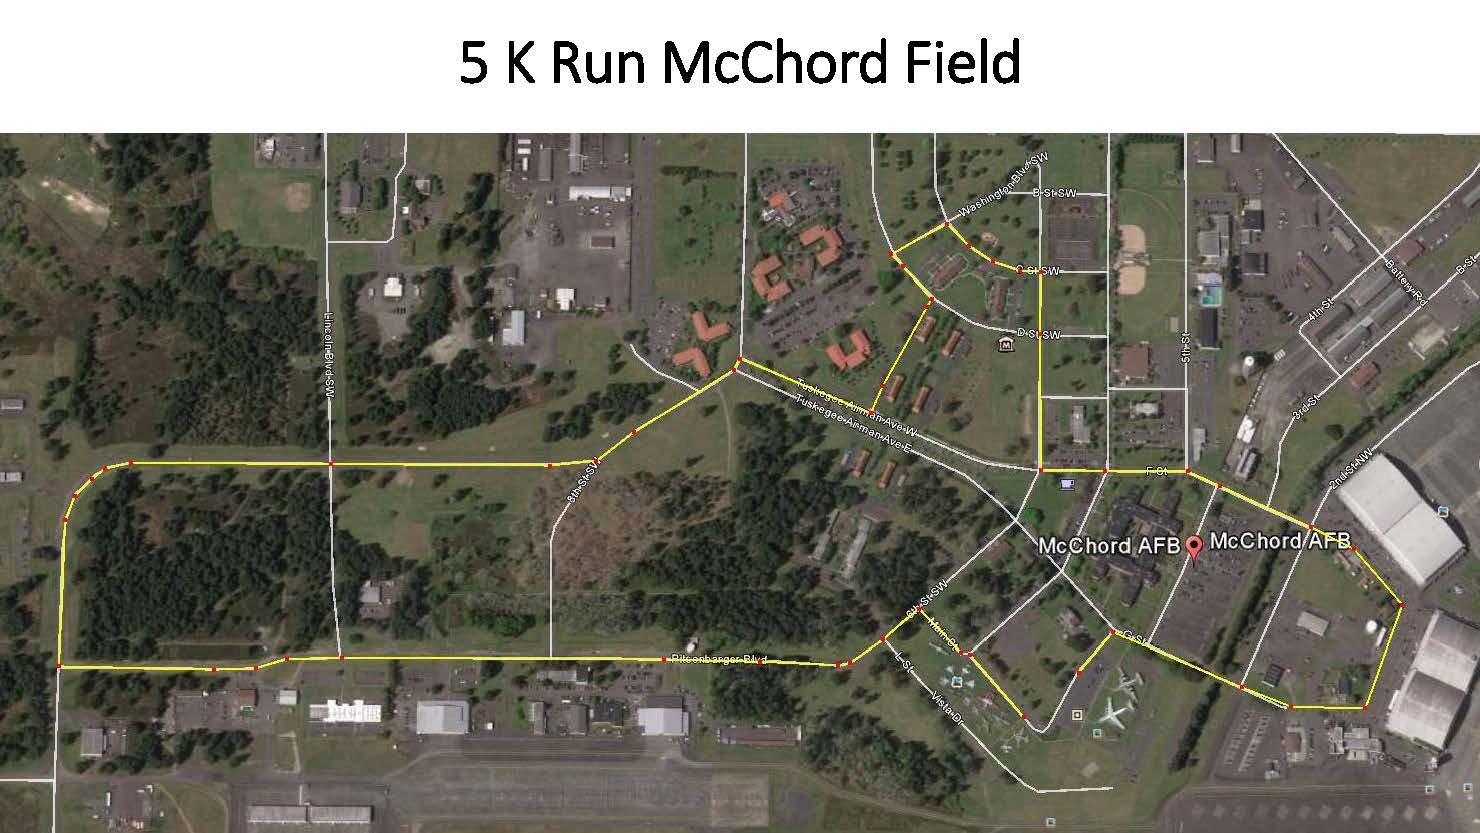 2017 Salmon Run - JBLM-MCCHORD FIELD, WA 2017   ACTIVE